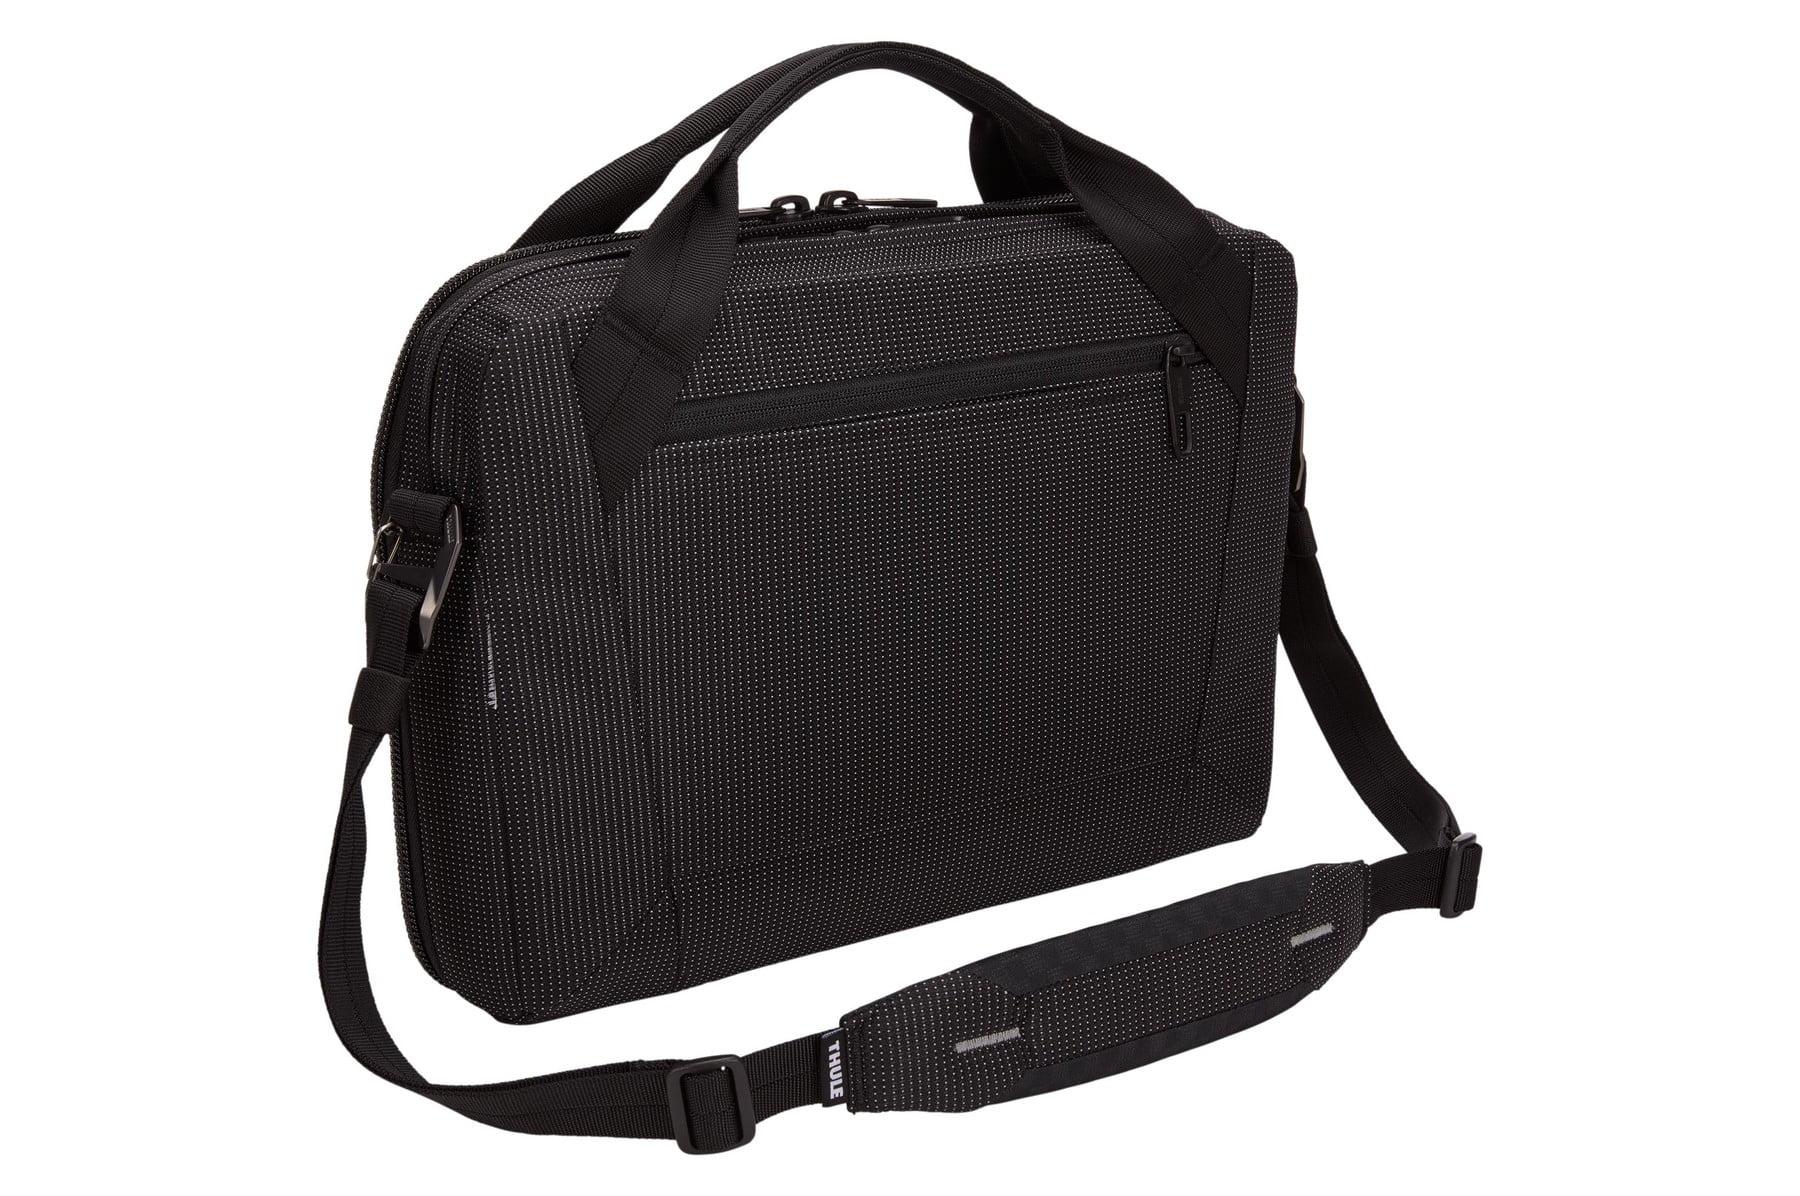 Geanta laptop Thule Crossover 2 Laptop Bag 13.3 Black 2